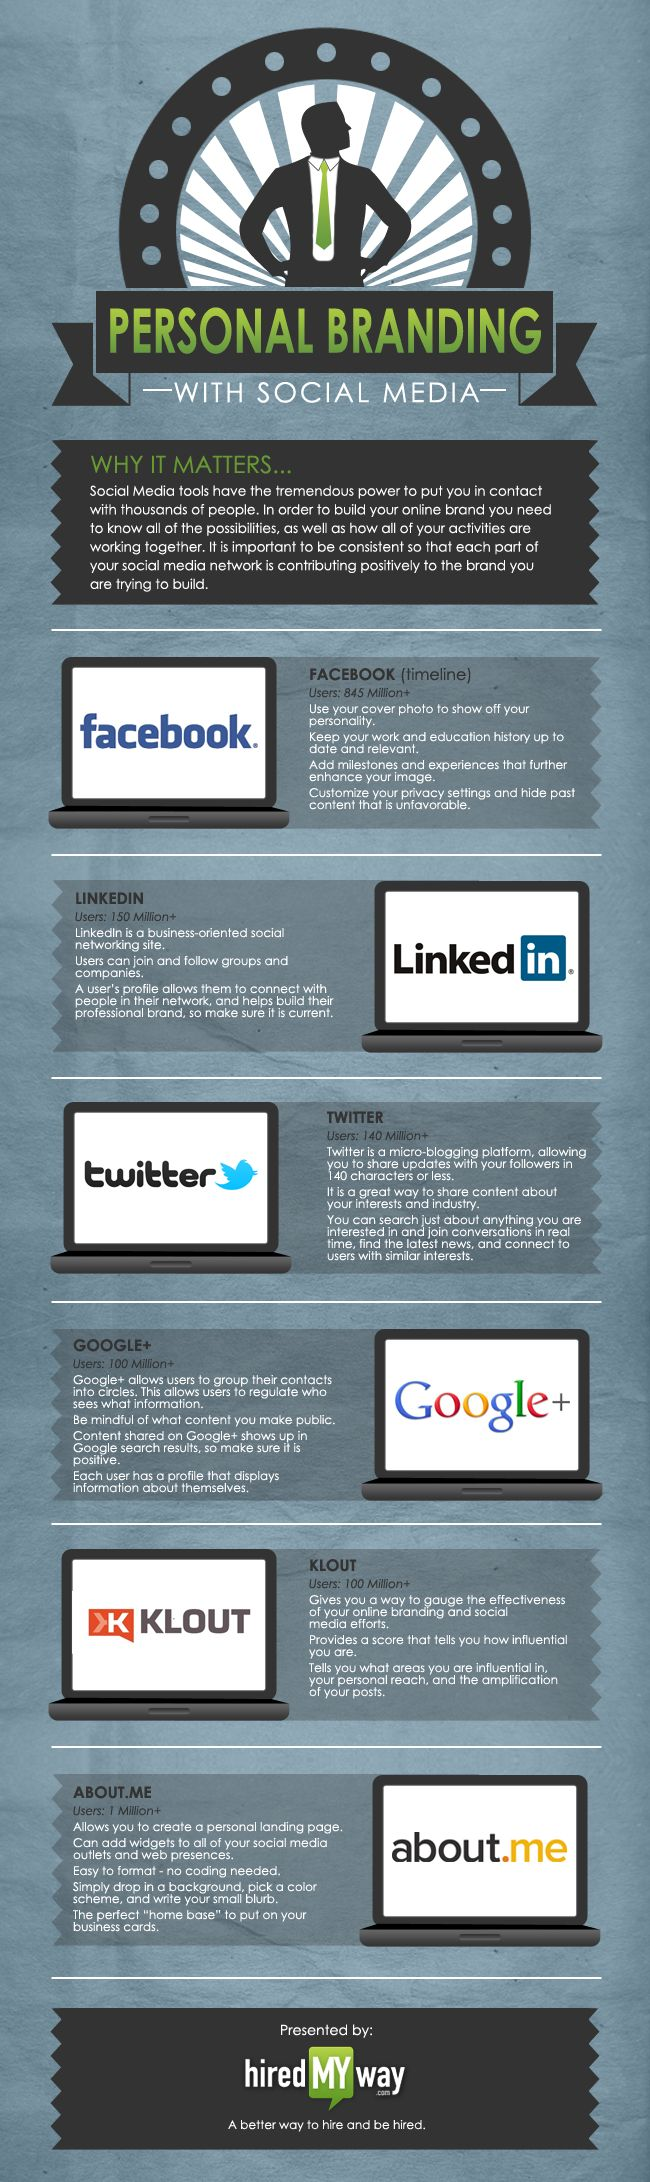 Personal branding with social media..j